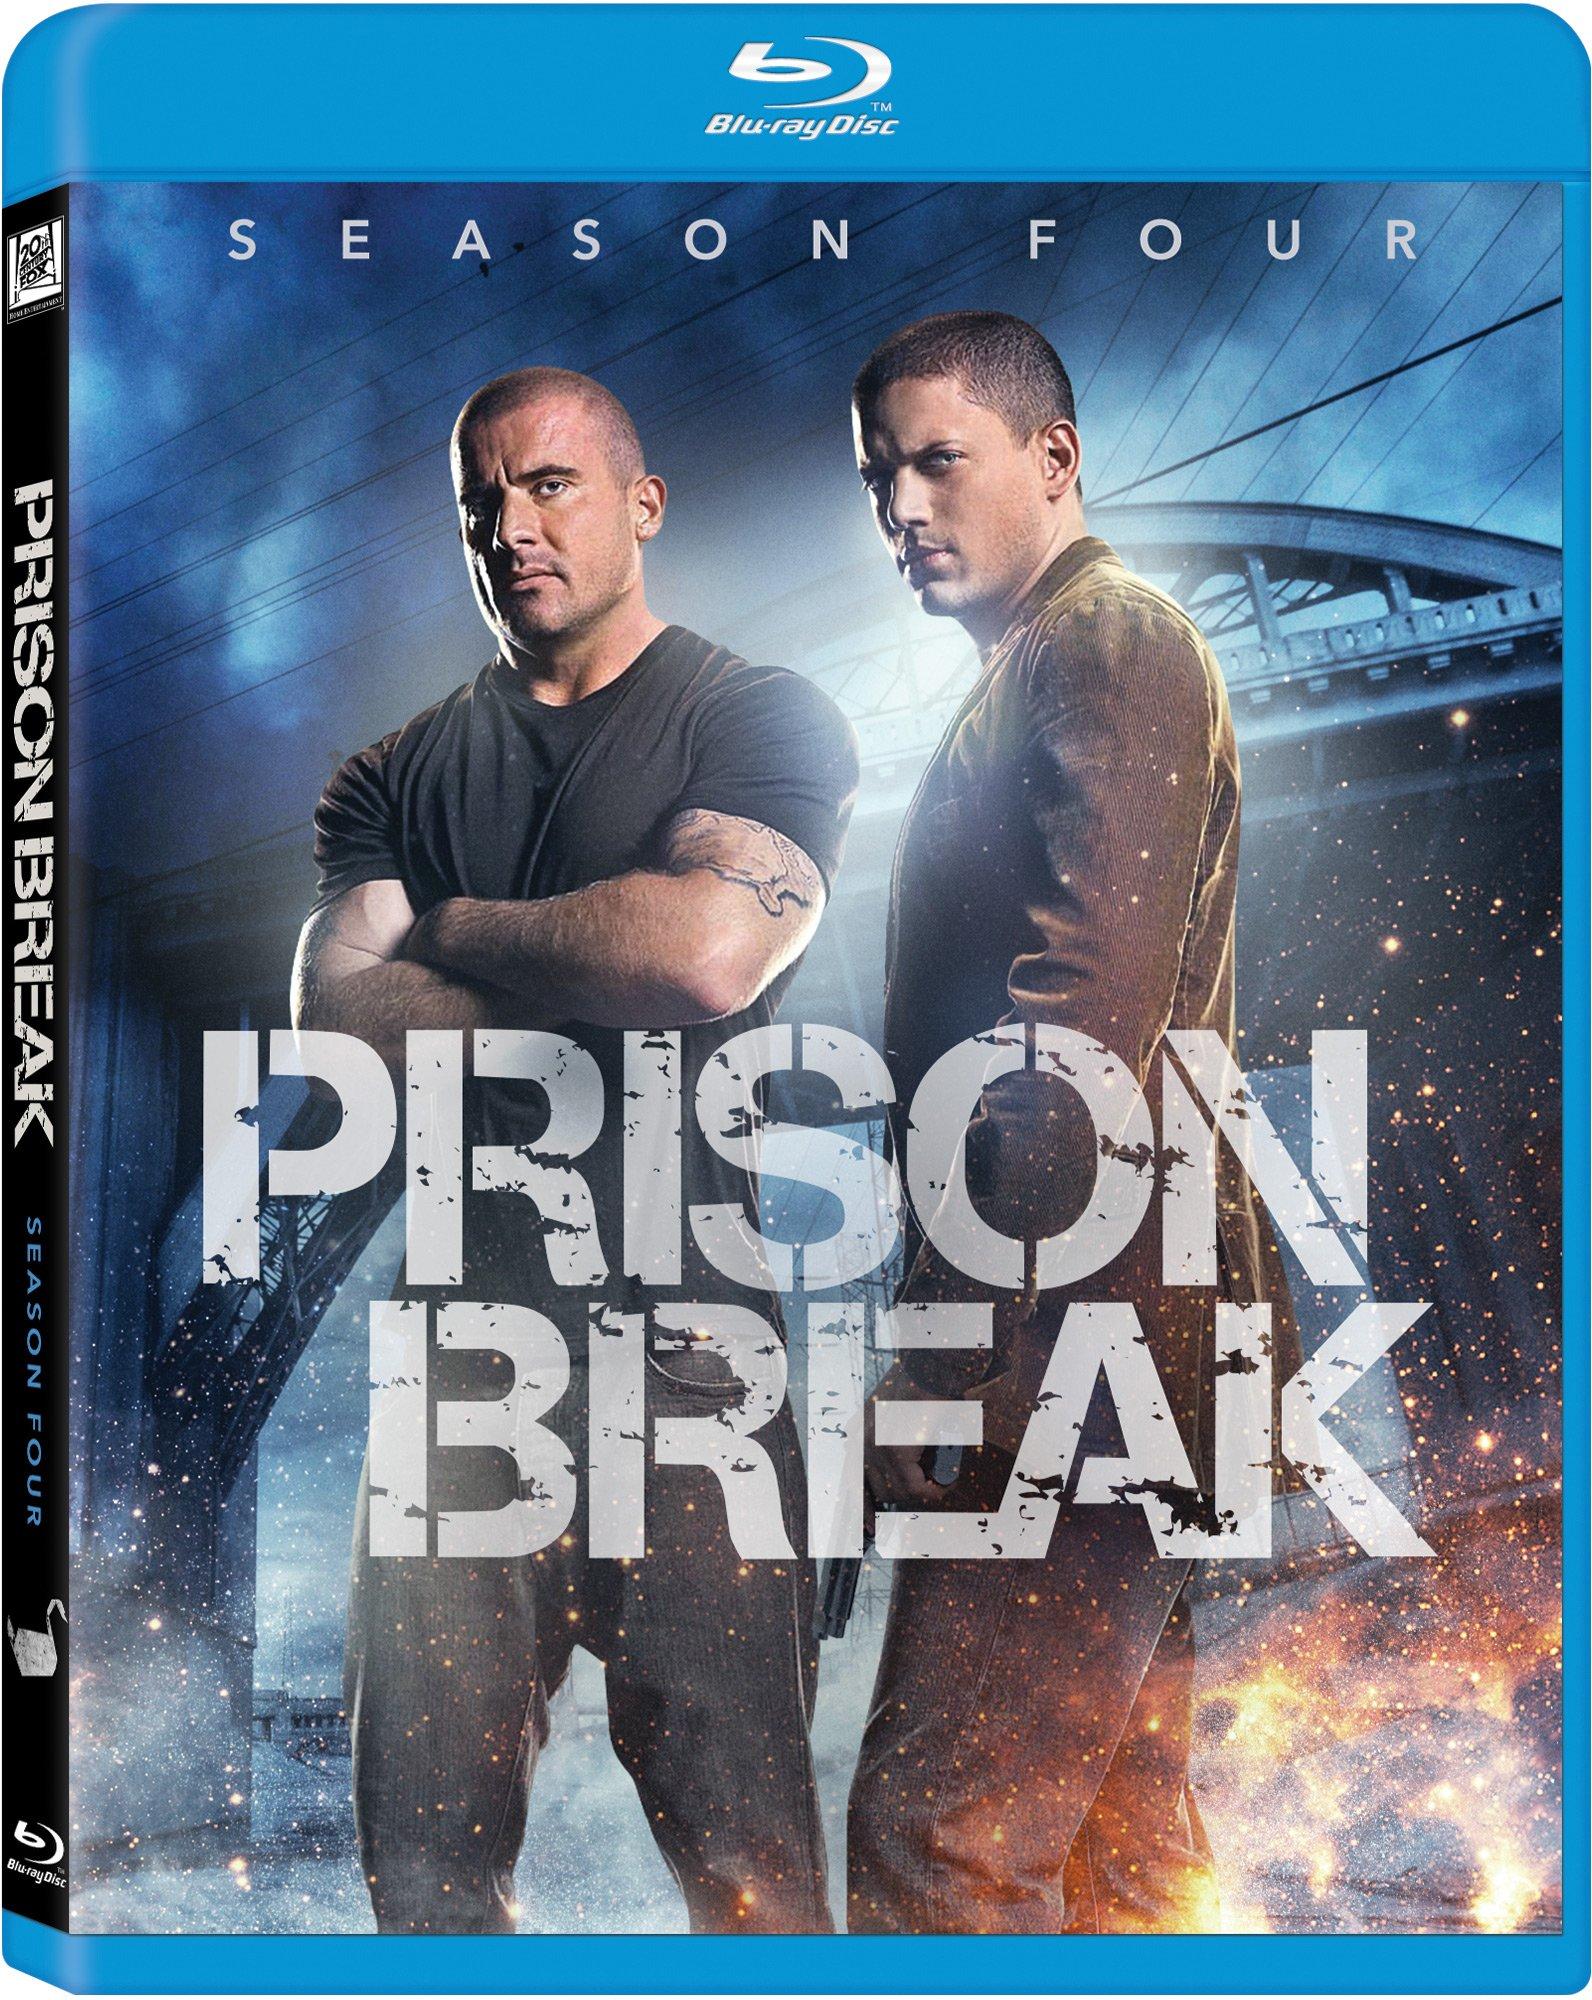 Blu-ray : Prison Break: Season 4 (Boxed Set, Widescreen, Digital Theater System, AC-3, Dolby)